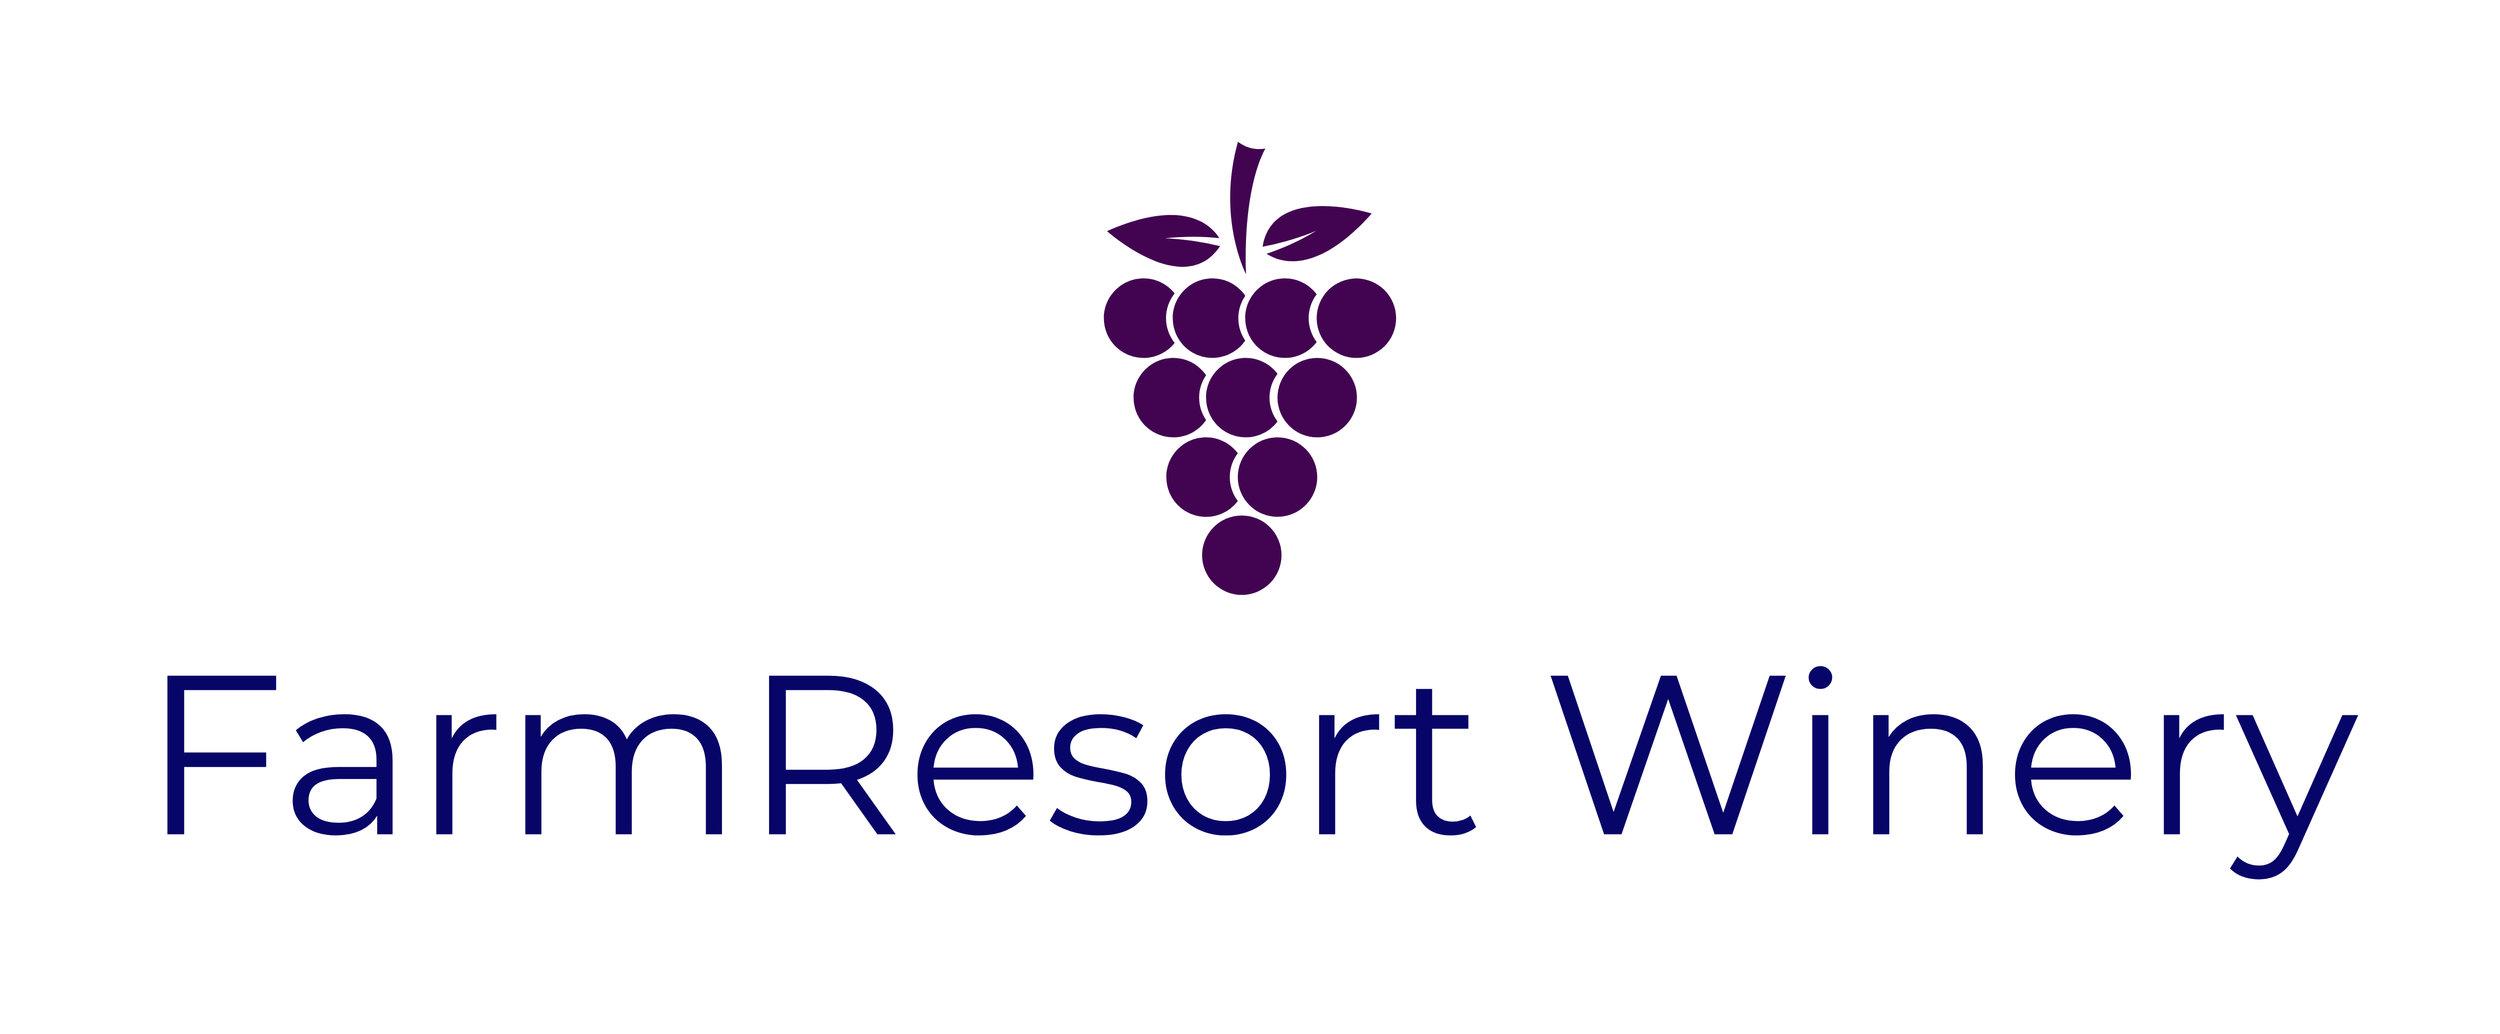 FarmResort Winery-logo High Quality #420351 Purple and #070568 Blue copy JPEG.jpg